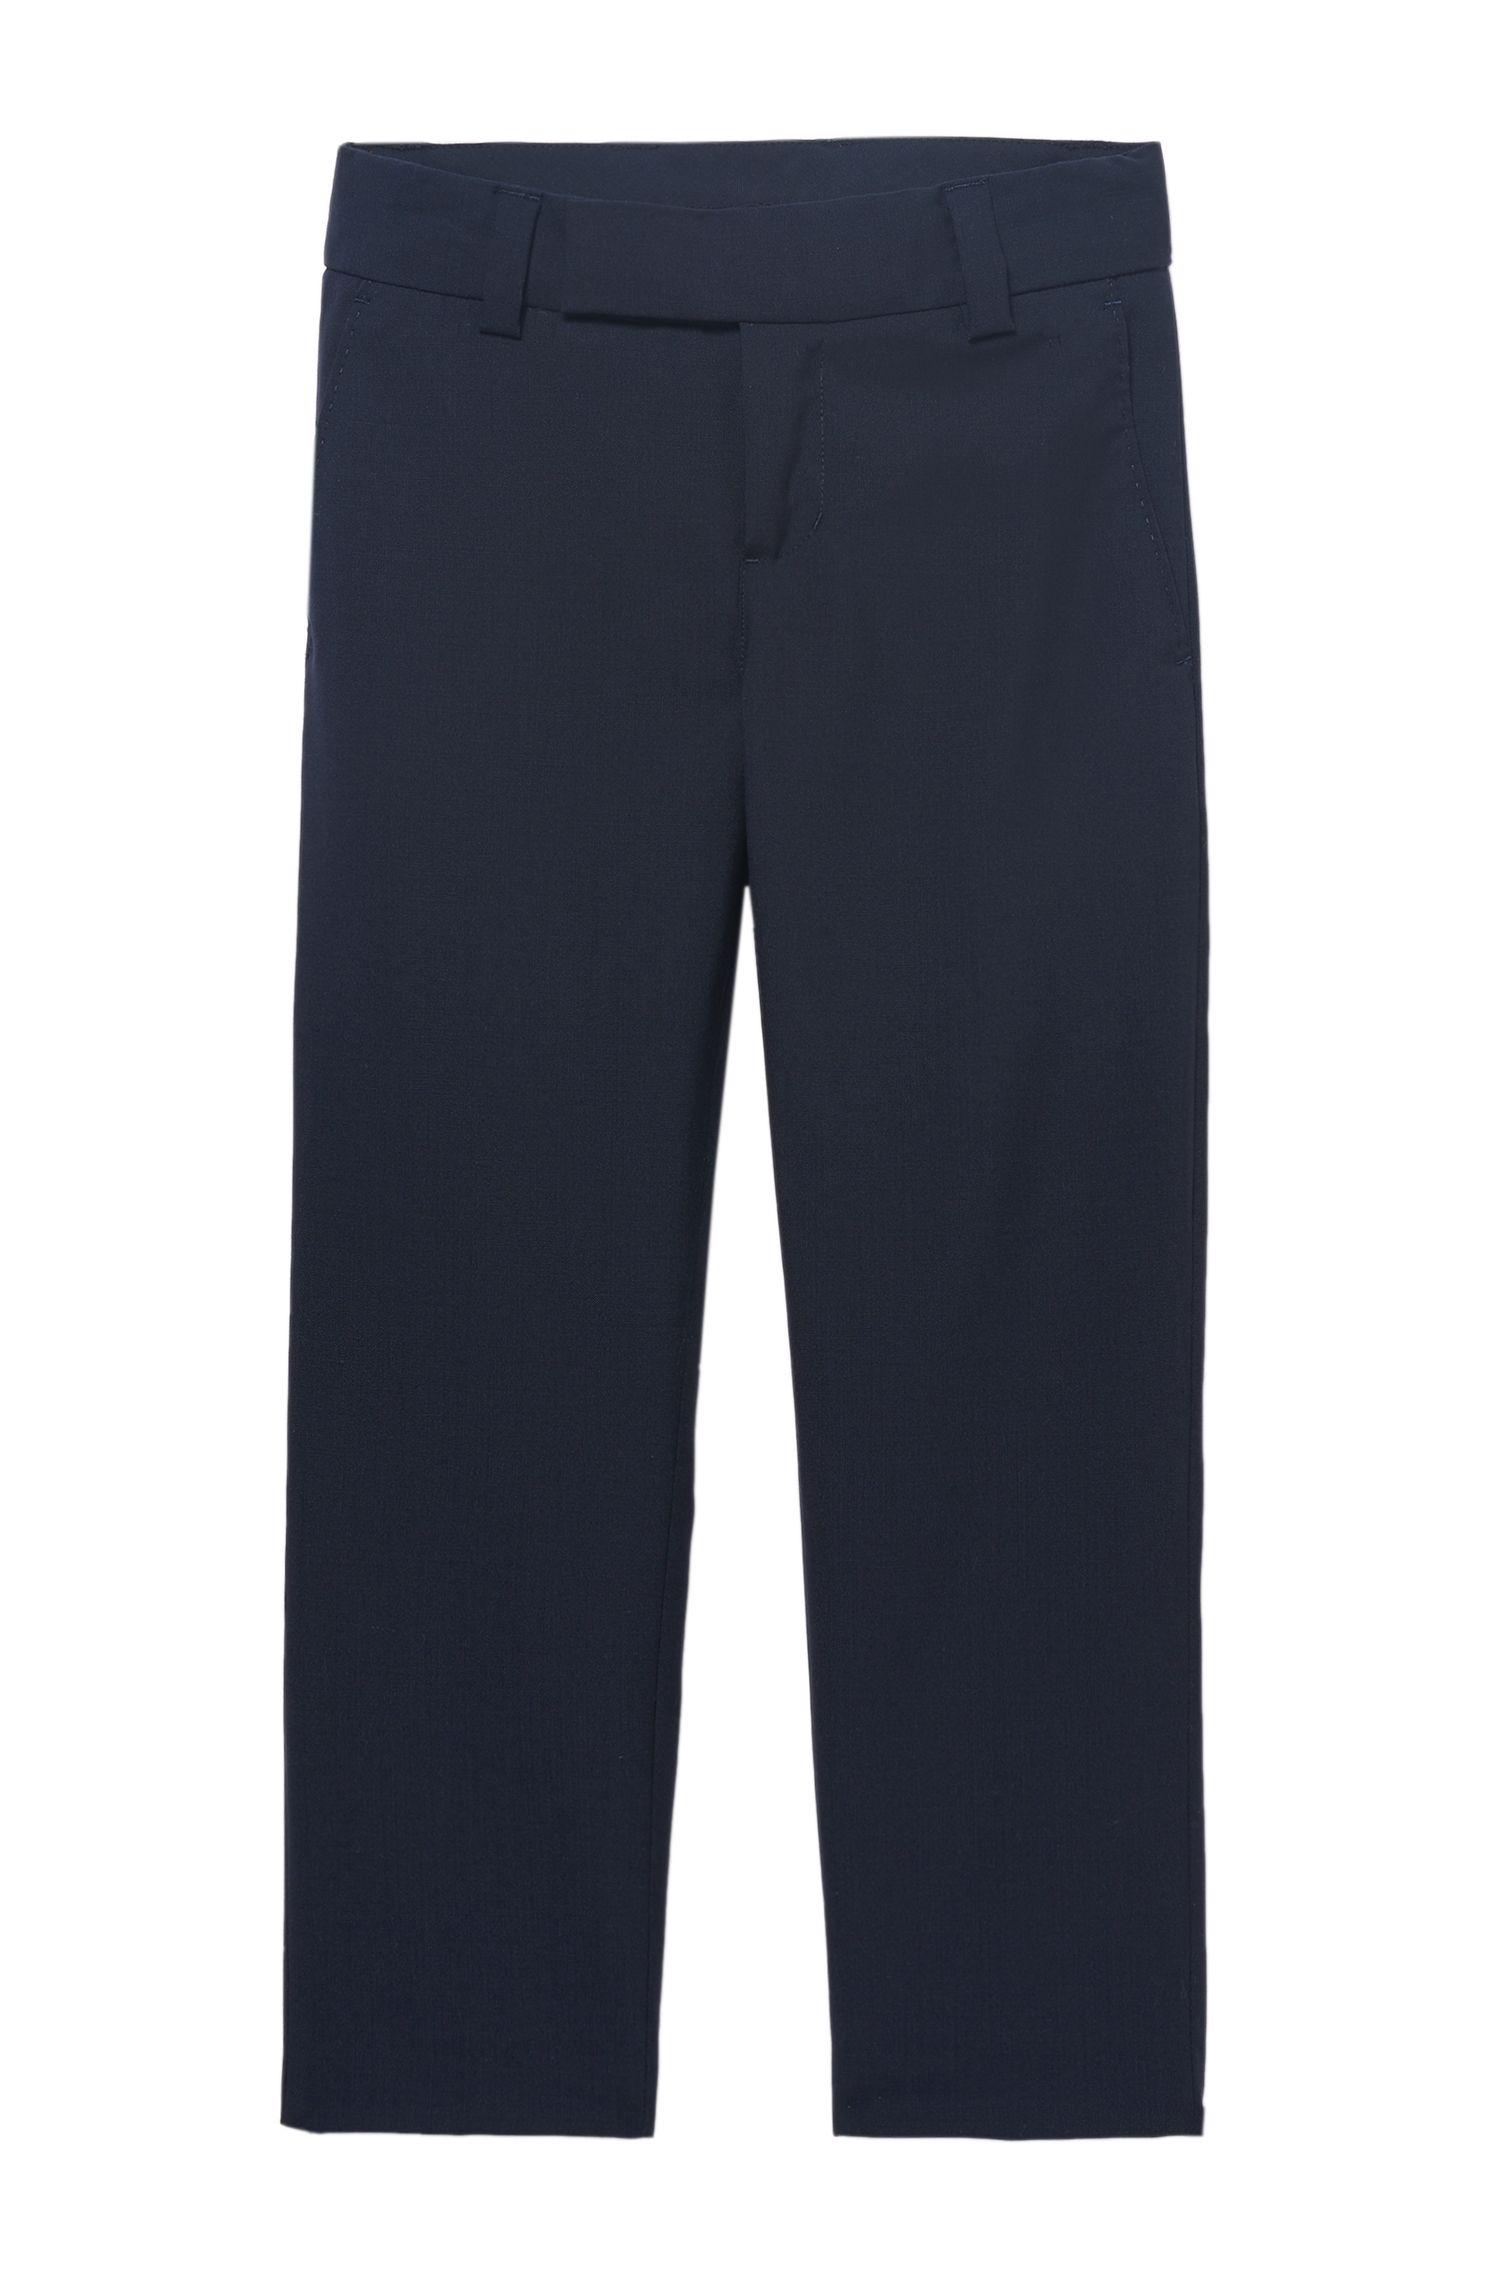 'J24V07' | Boys Wool Dress Pants